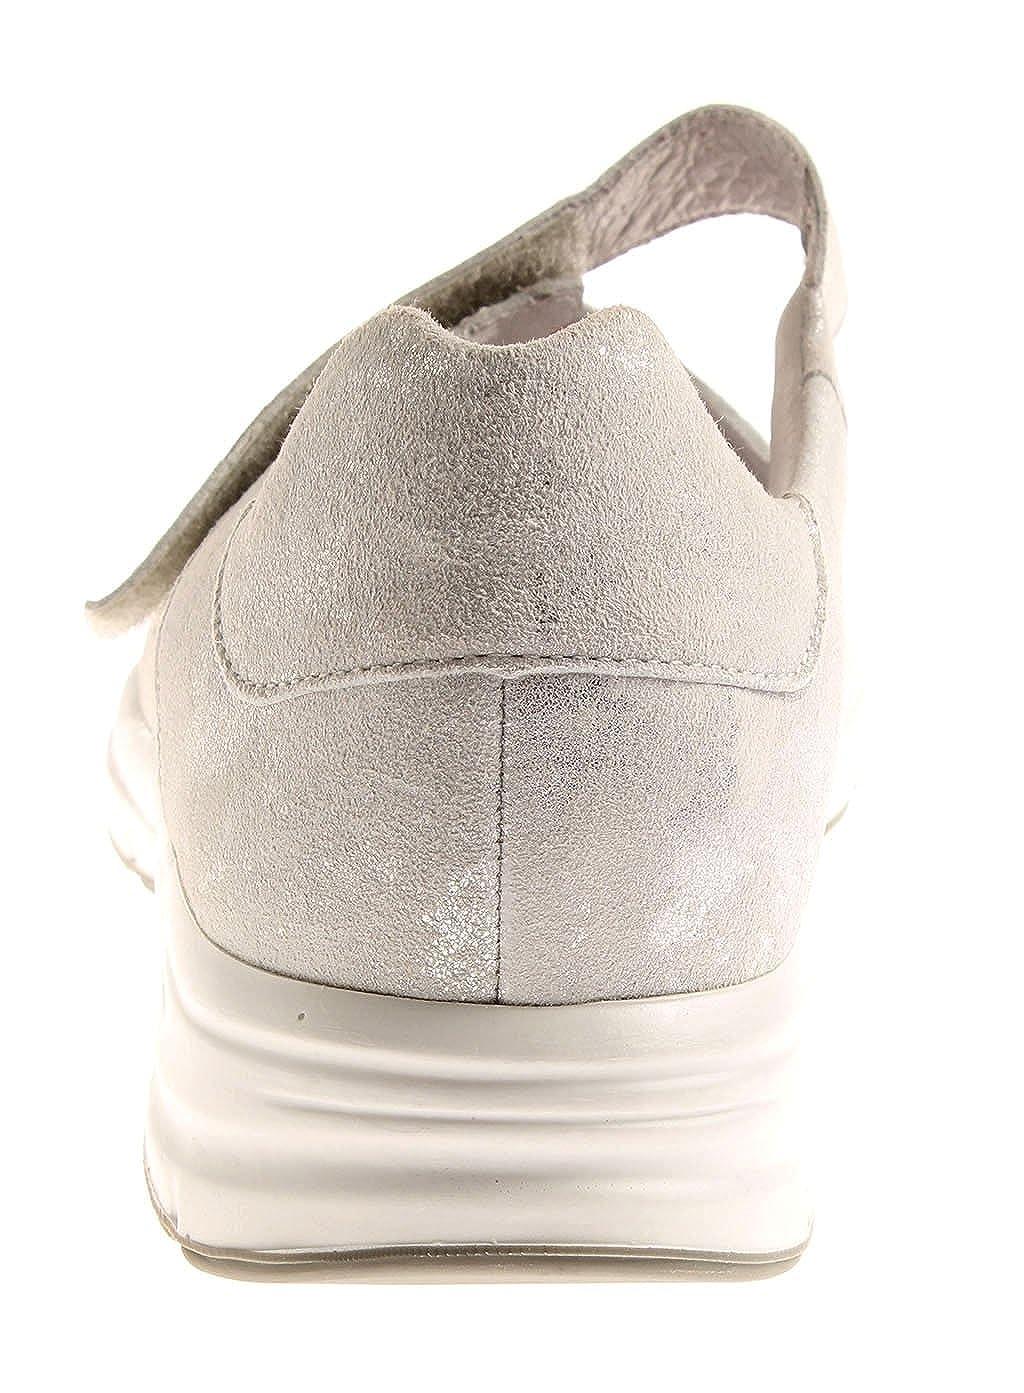 Semler Sportliche Ballerinas U5045 Damenschuhe Weich Leder Schuhe U5045 Ballerinas bd3af7